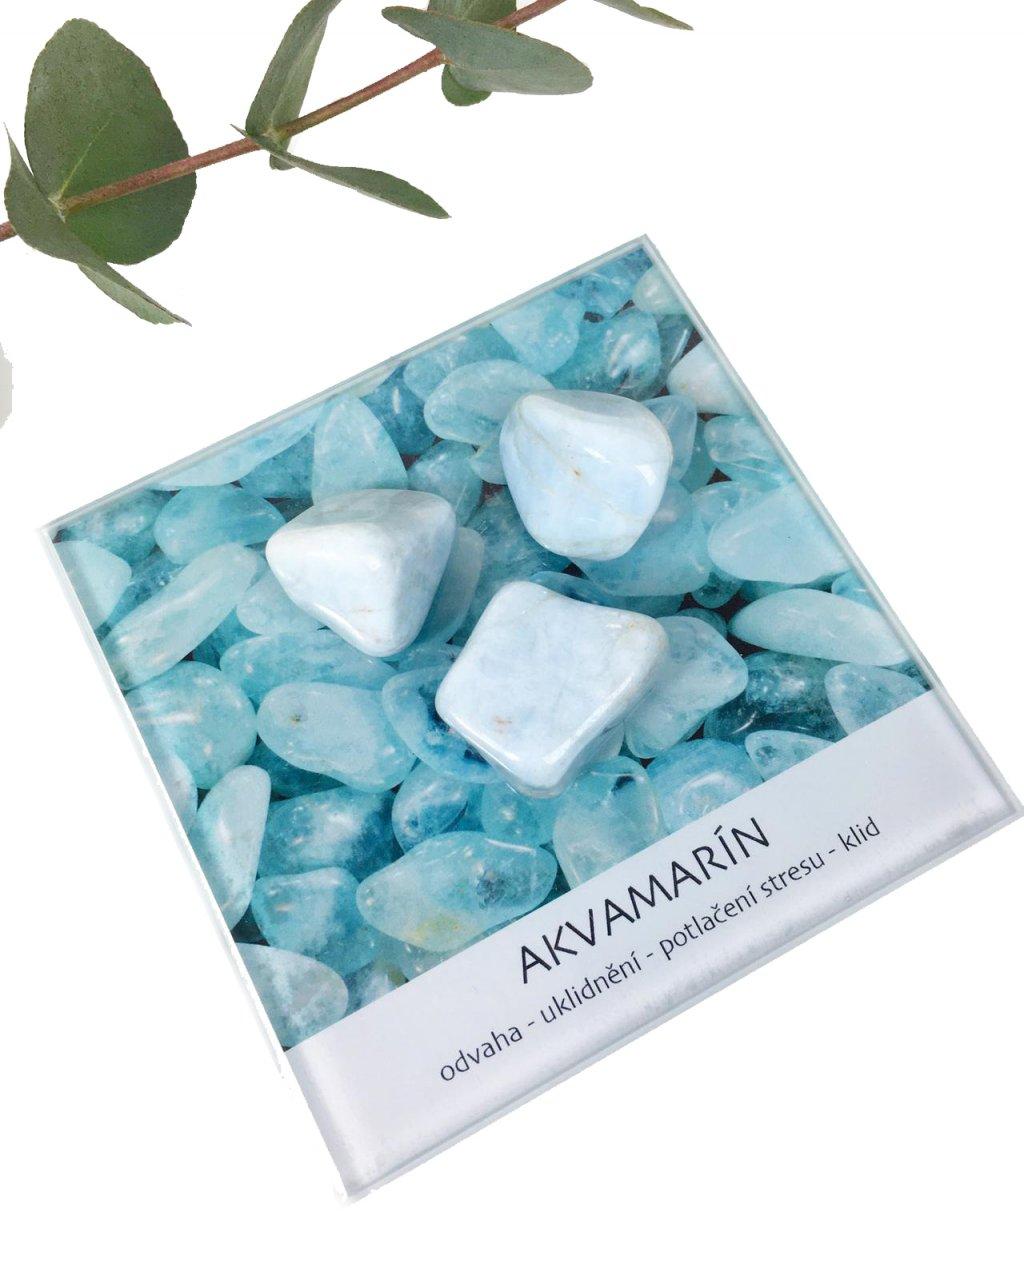 Akvamarín kámen minerál dekorační set